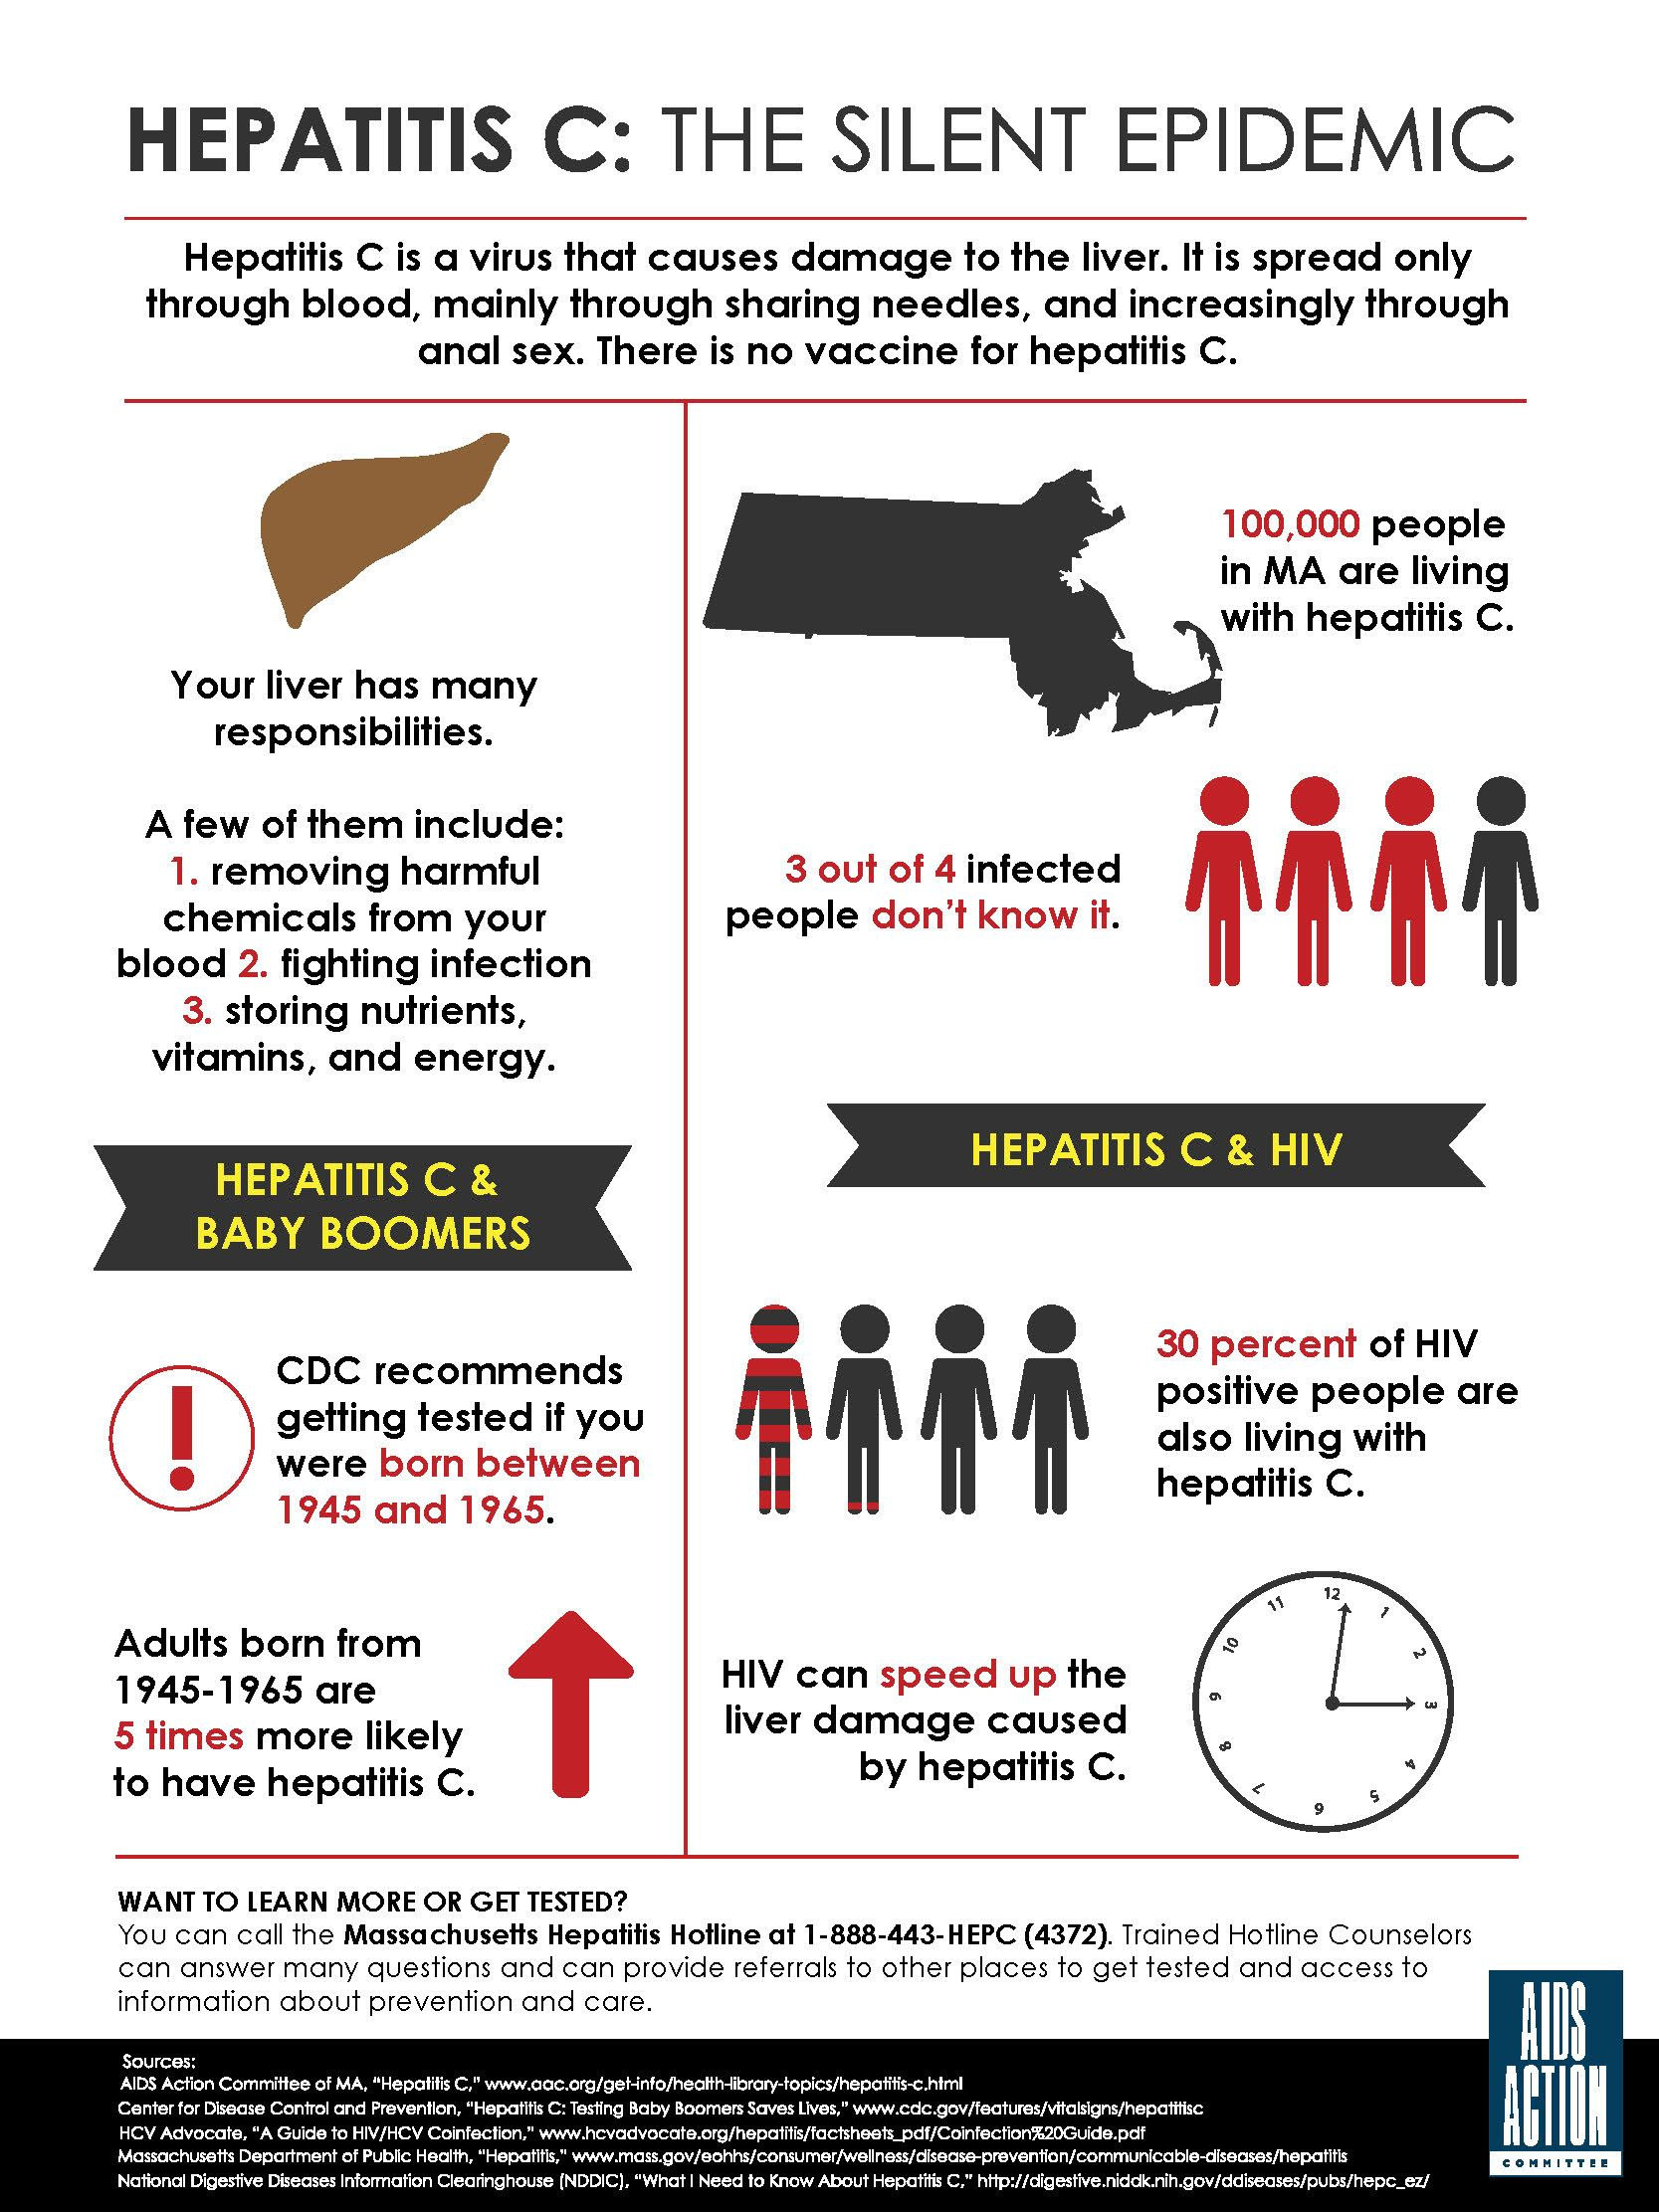 Chronic hepatitis can be asymptomatic